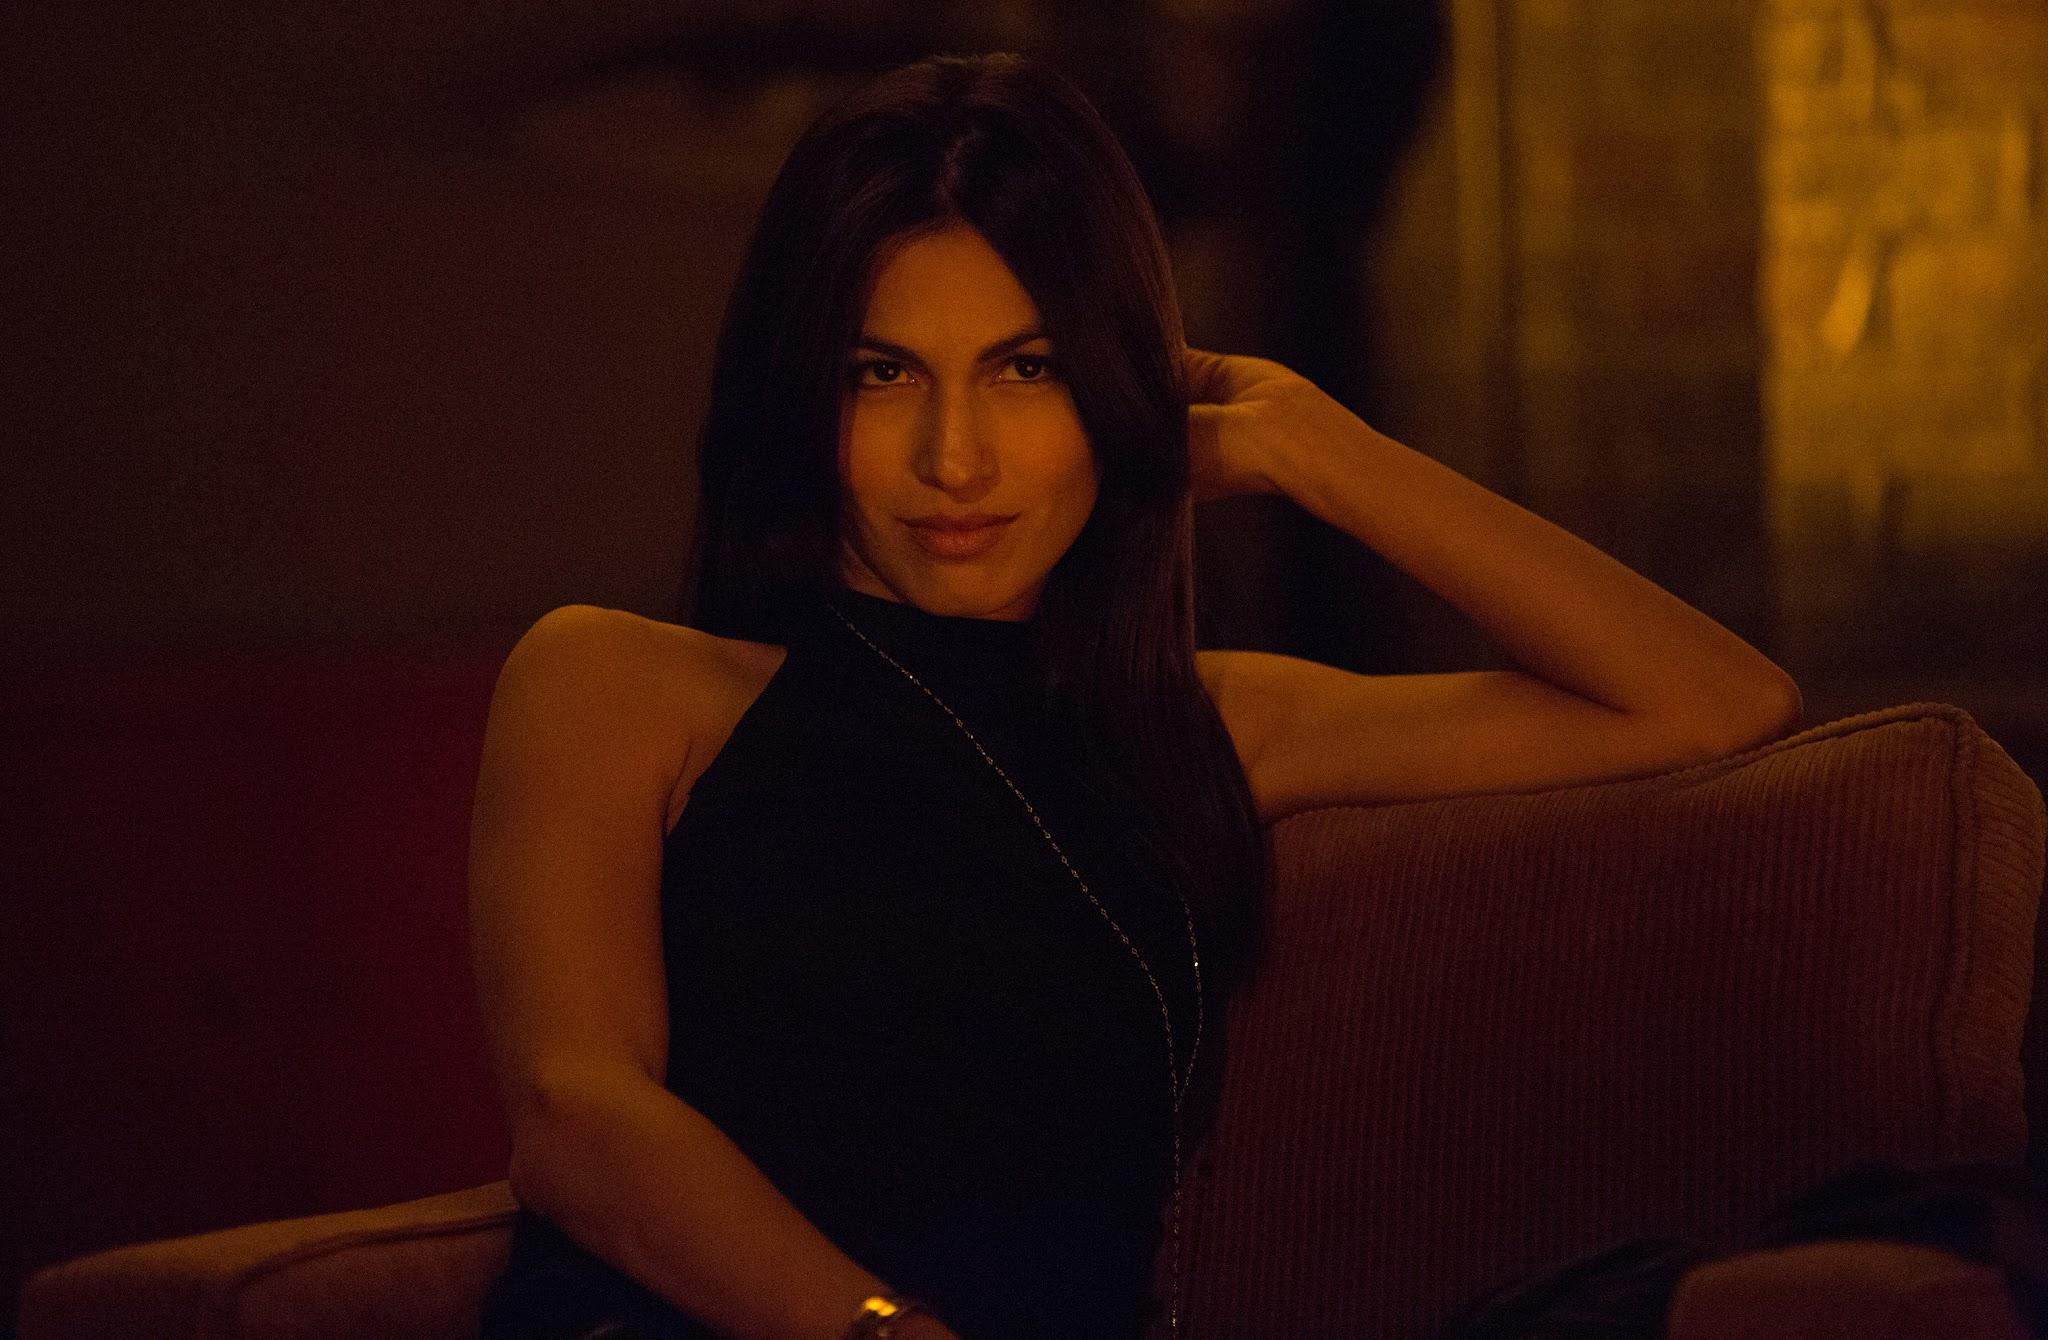 Daredevil Season 2 First Look: Elektra Looks Classy For Netflix's Storyline #35377